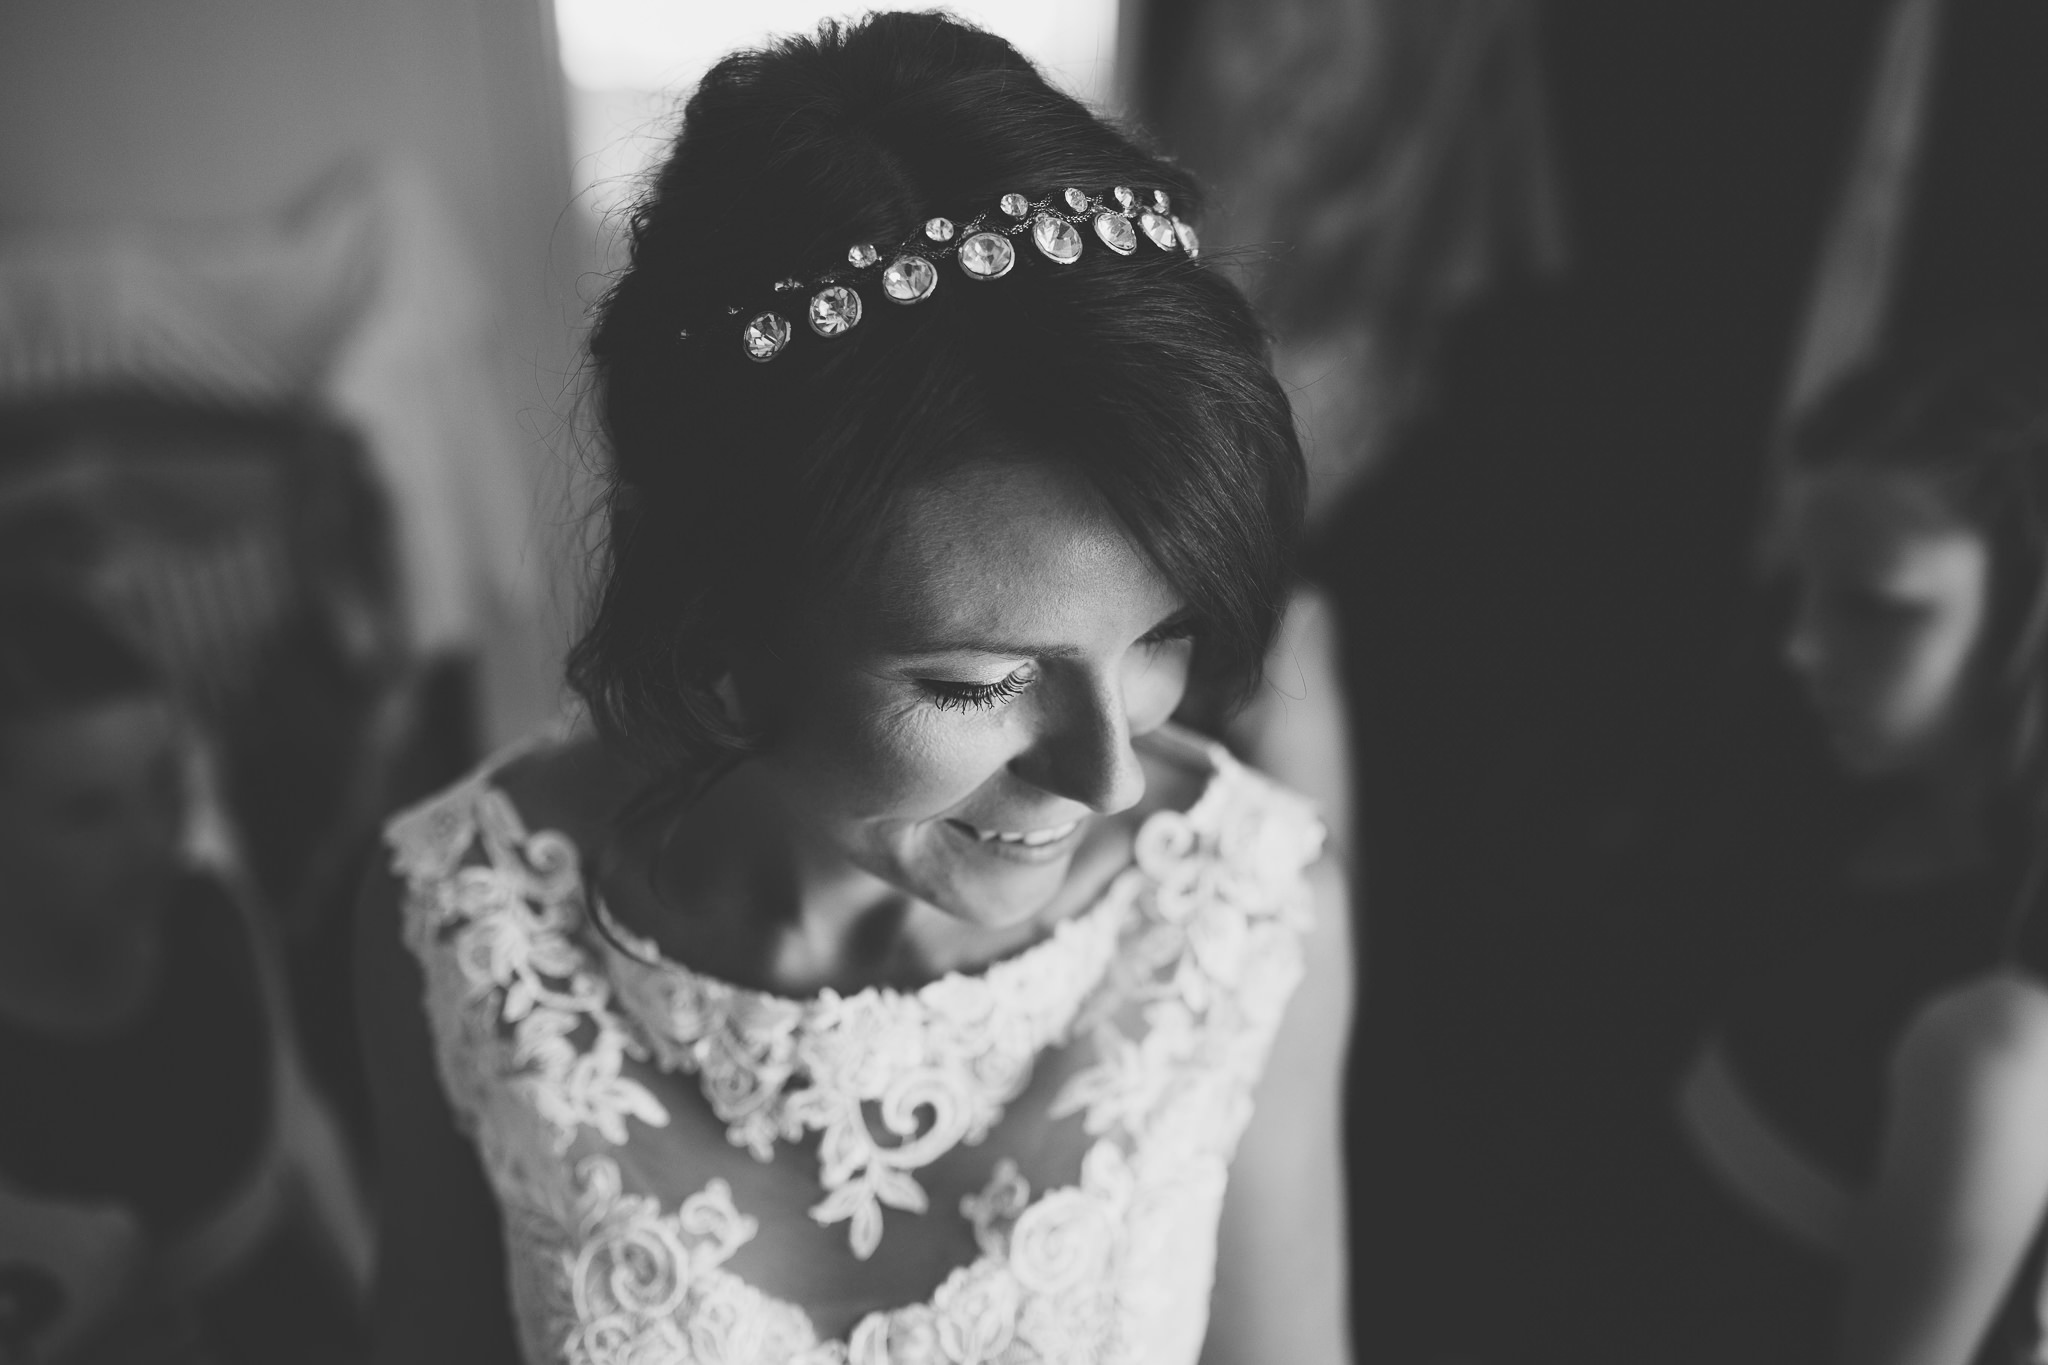 paul-marbrook-Caer-Llan-Wedding-Photographer-90032